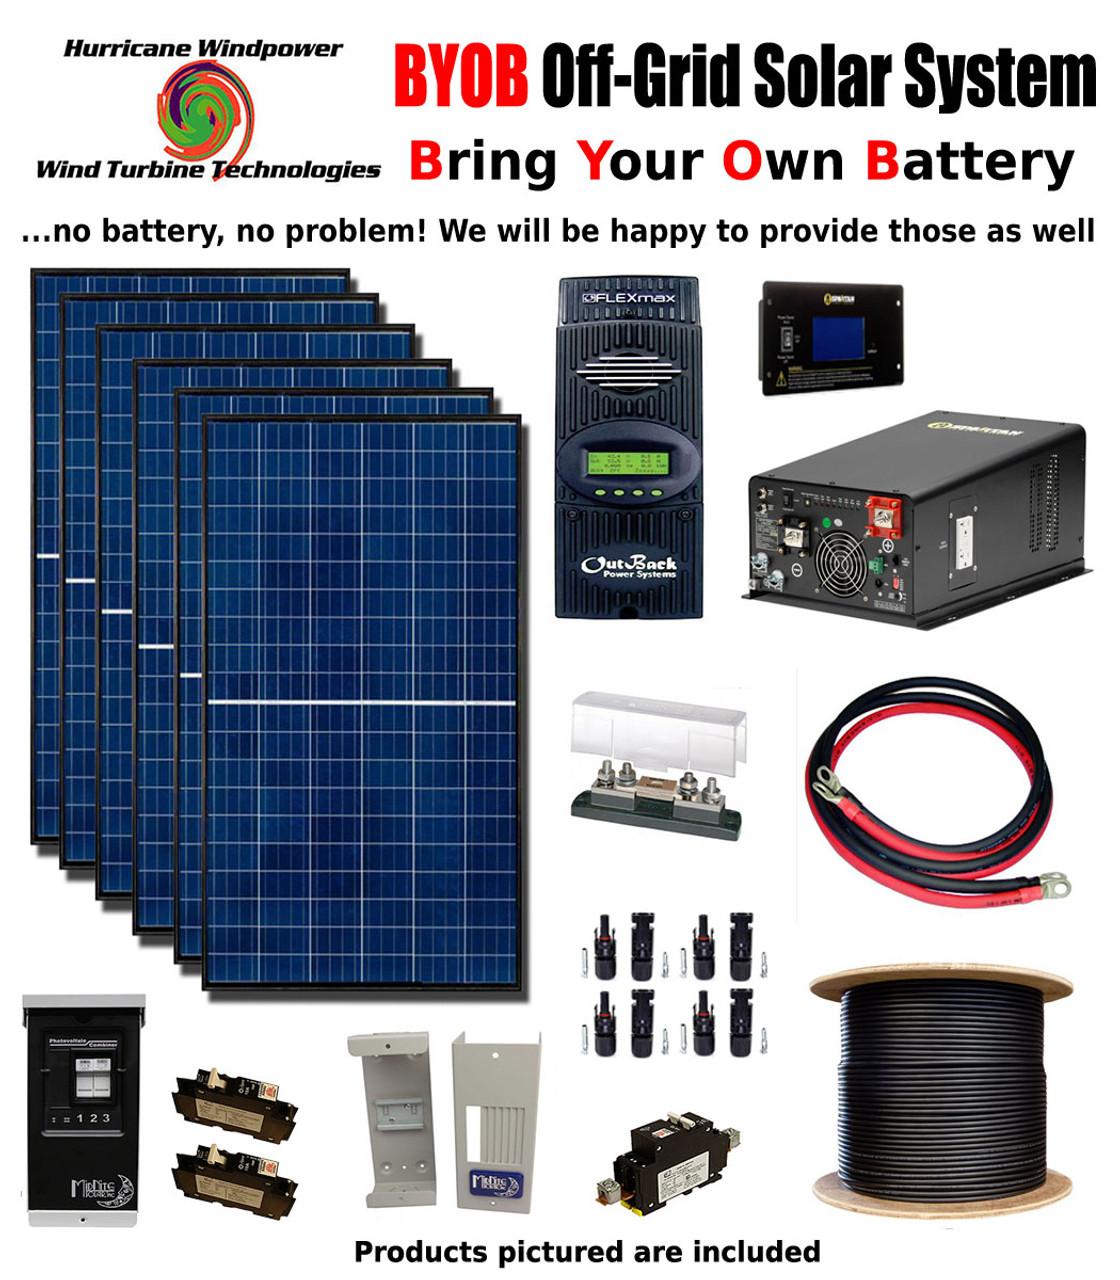 BYOB Off-Grid 1 7KW 24V Solar Panel Kit Tiny House Cabin PV System Outback  FM80